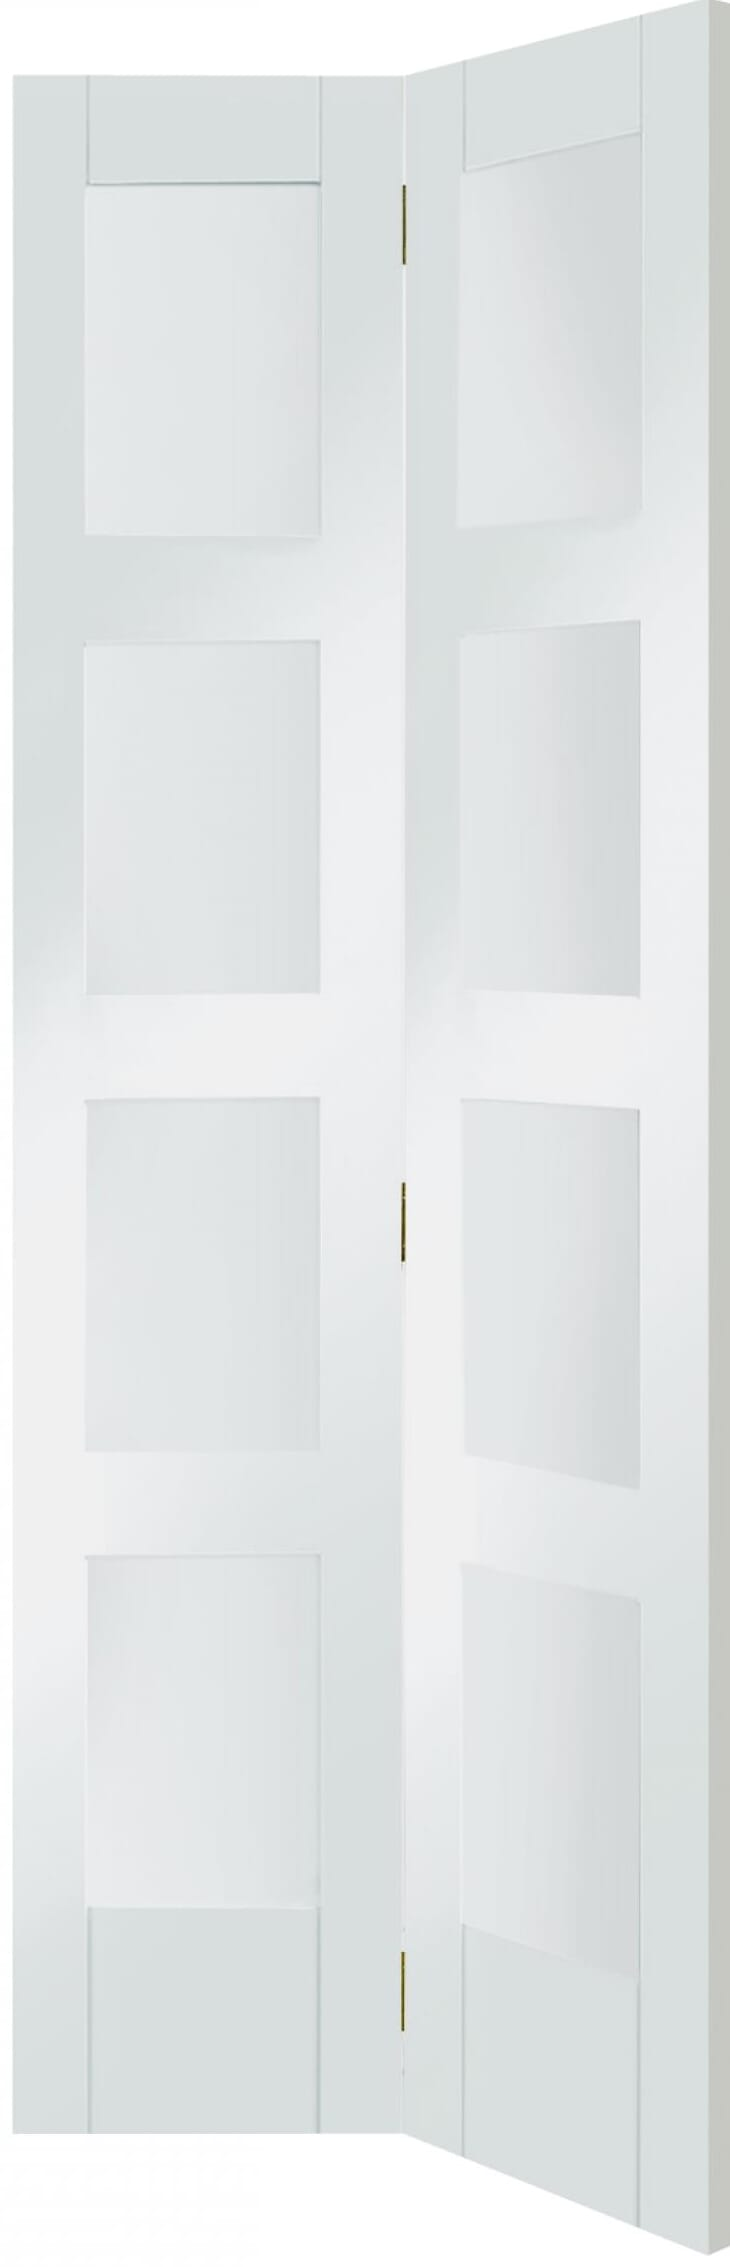 4 Light White Shaker Bi-fold - Clear Glass Image